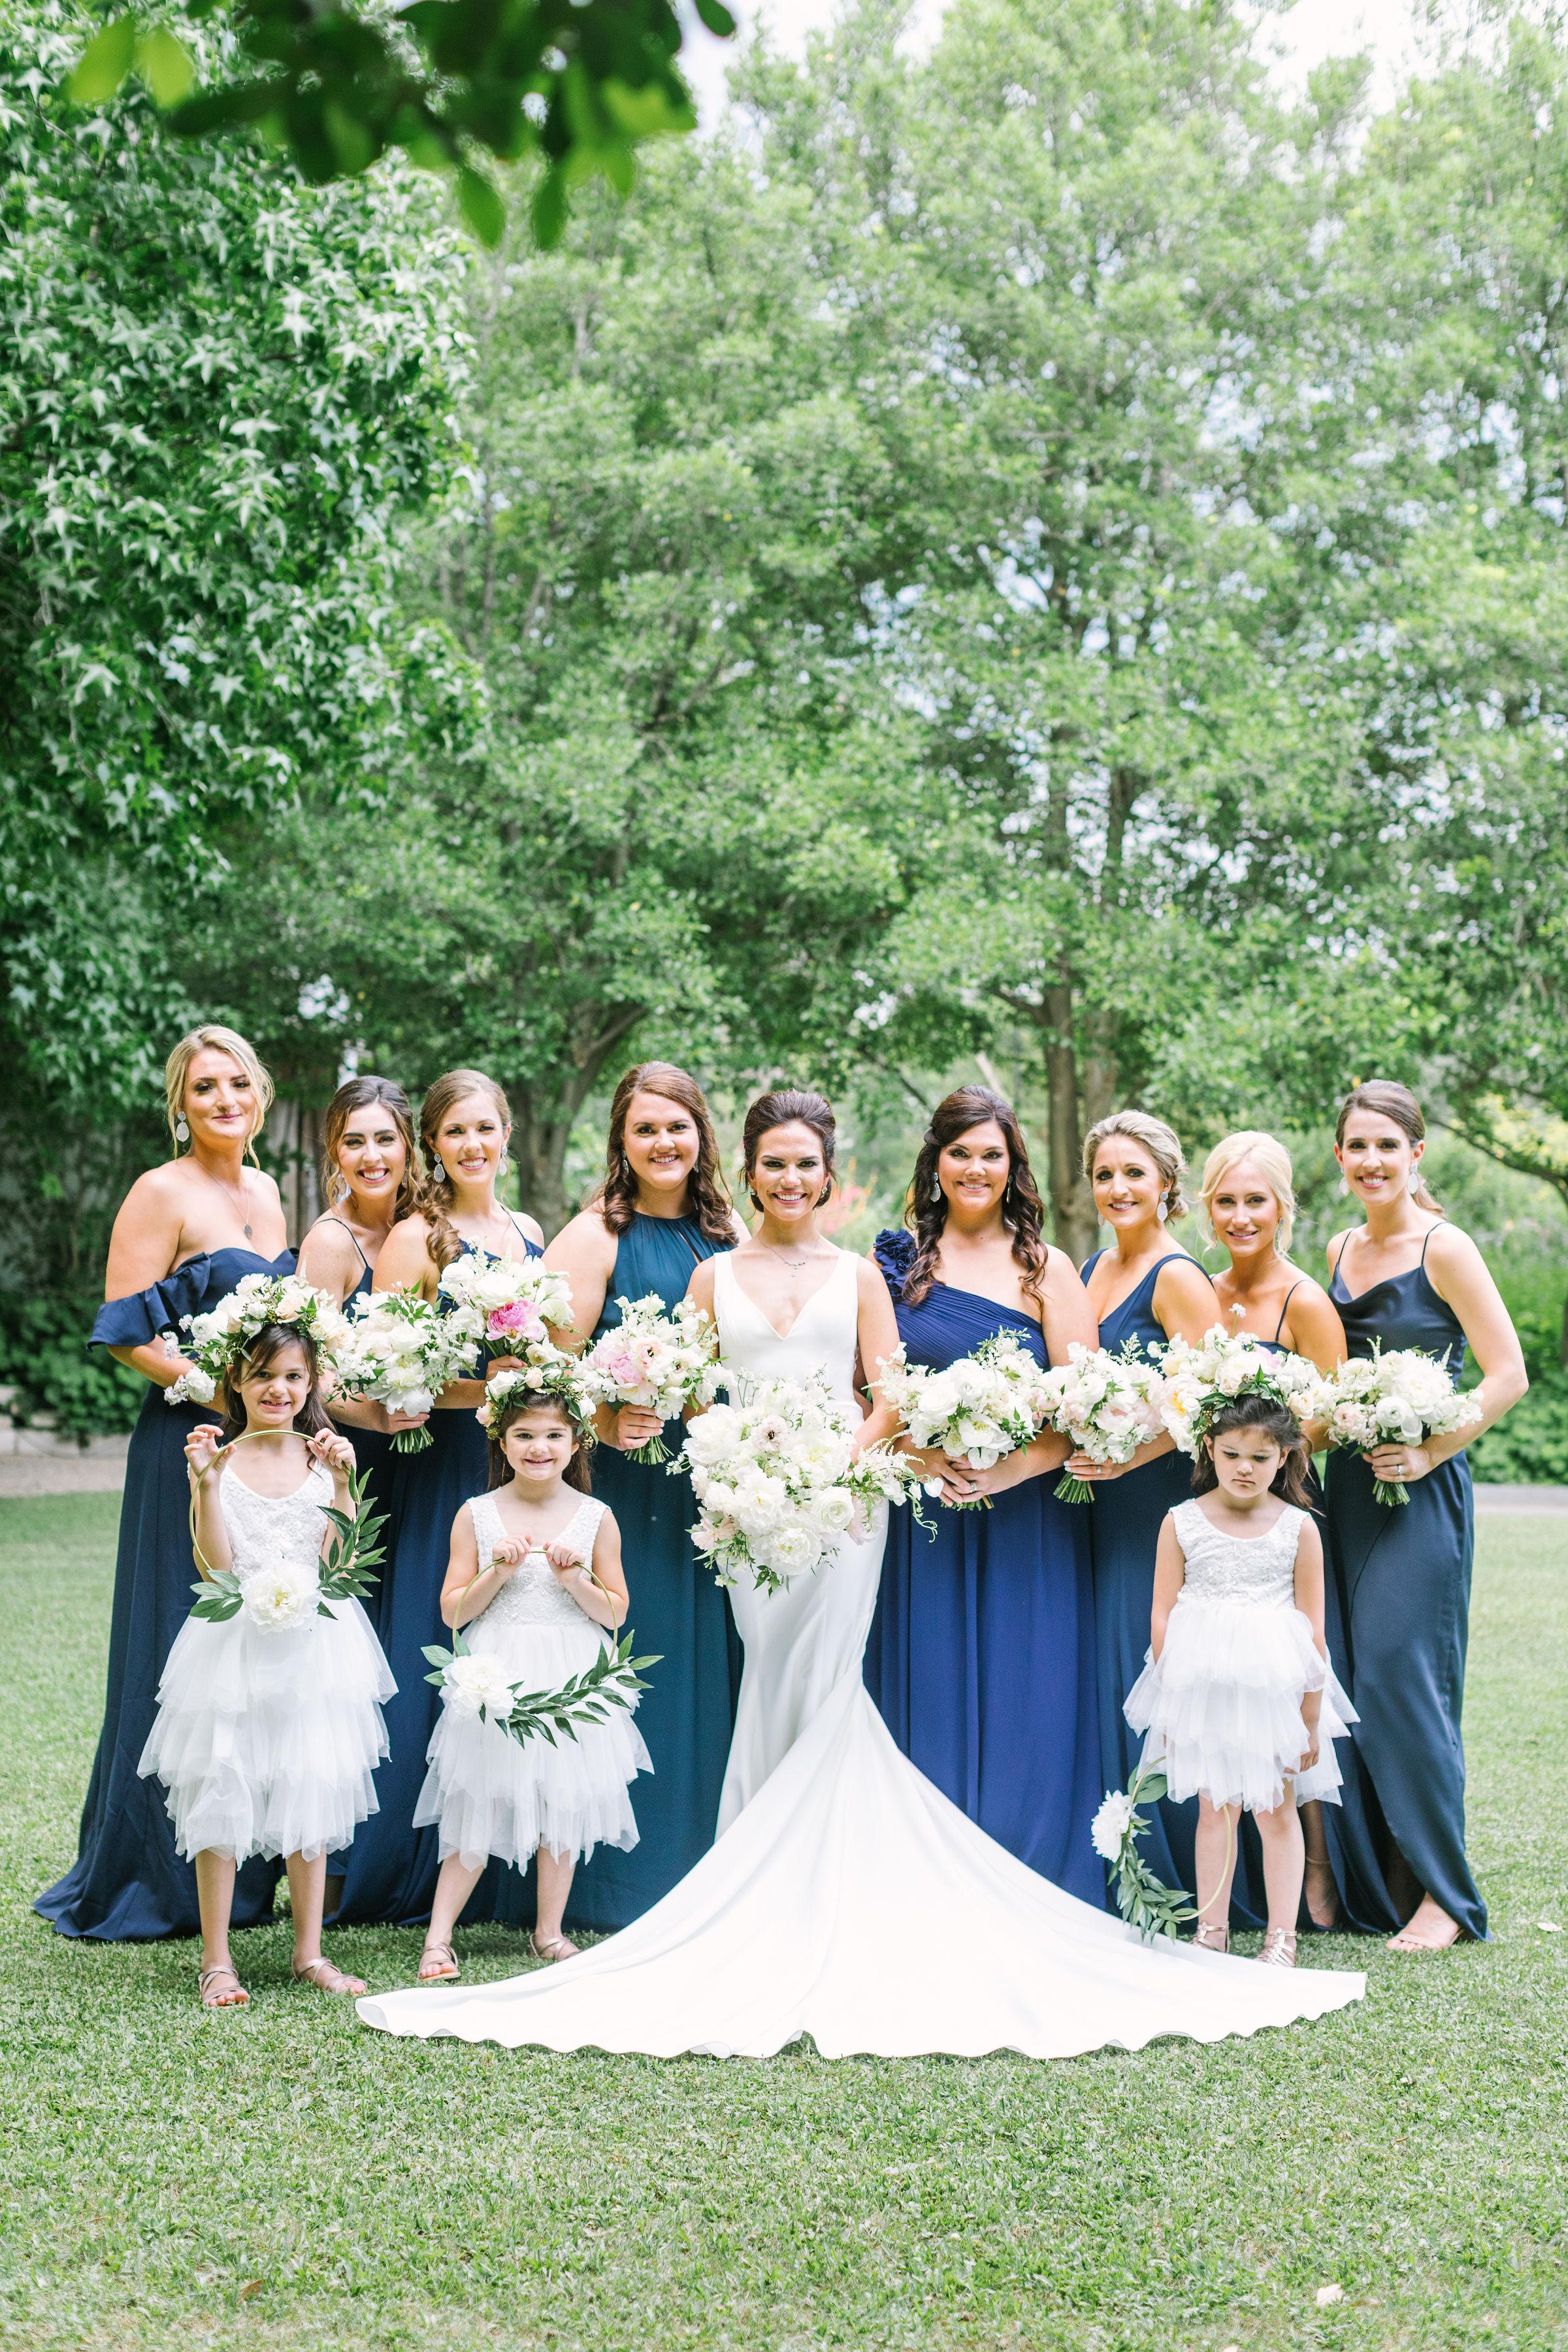 Erin-And-Her-Girls-Ivory-and-Vine-Weddings.jpg